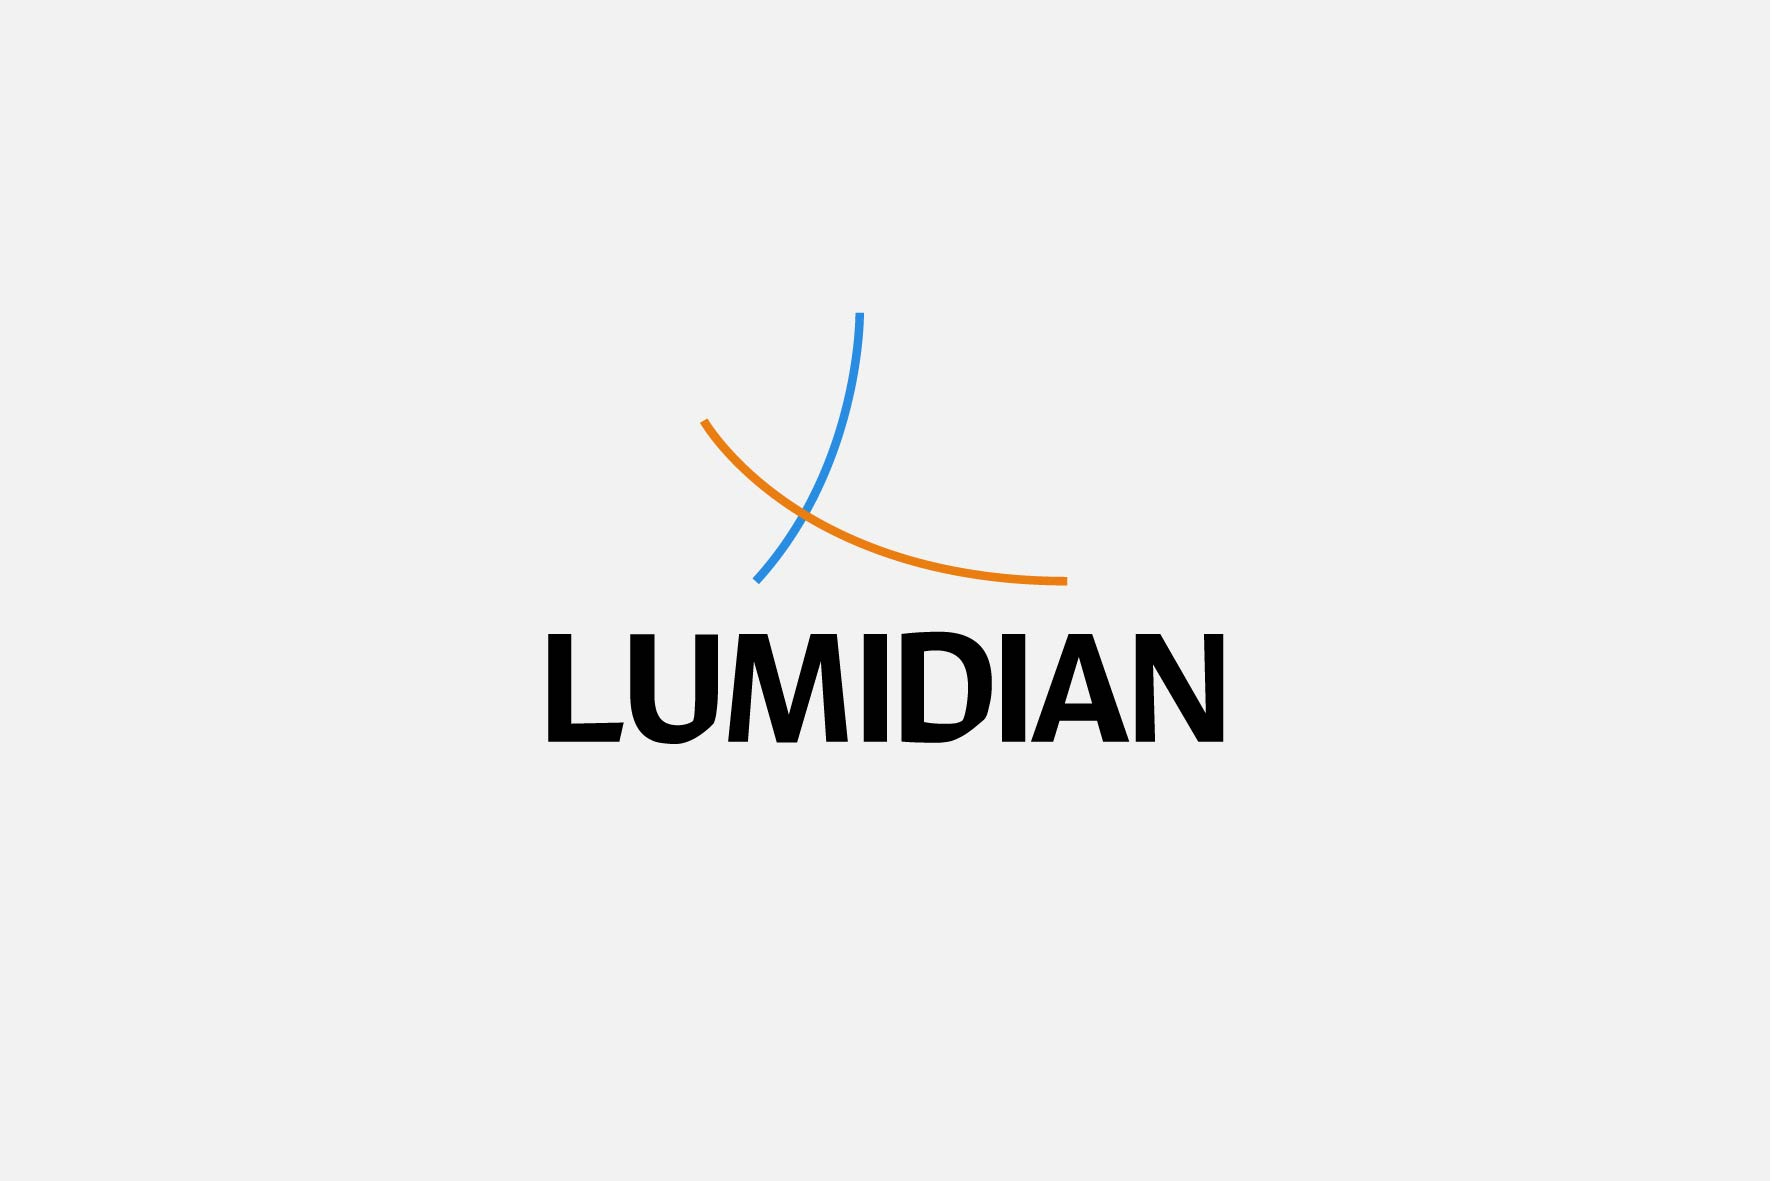 Bitflow-studio-lumidian-logo-design